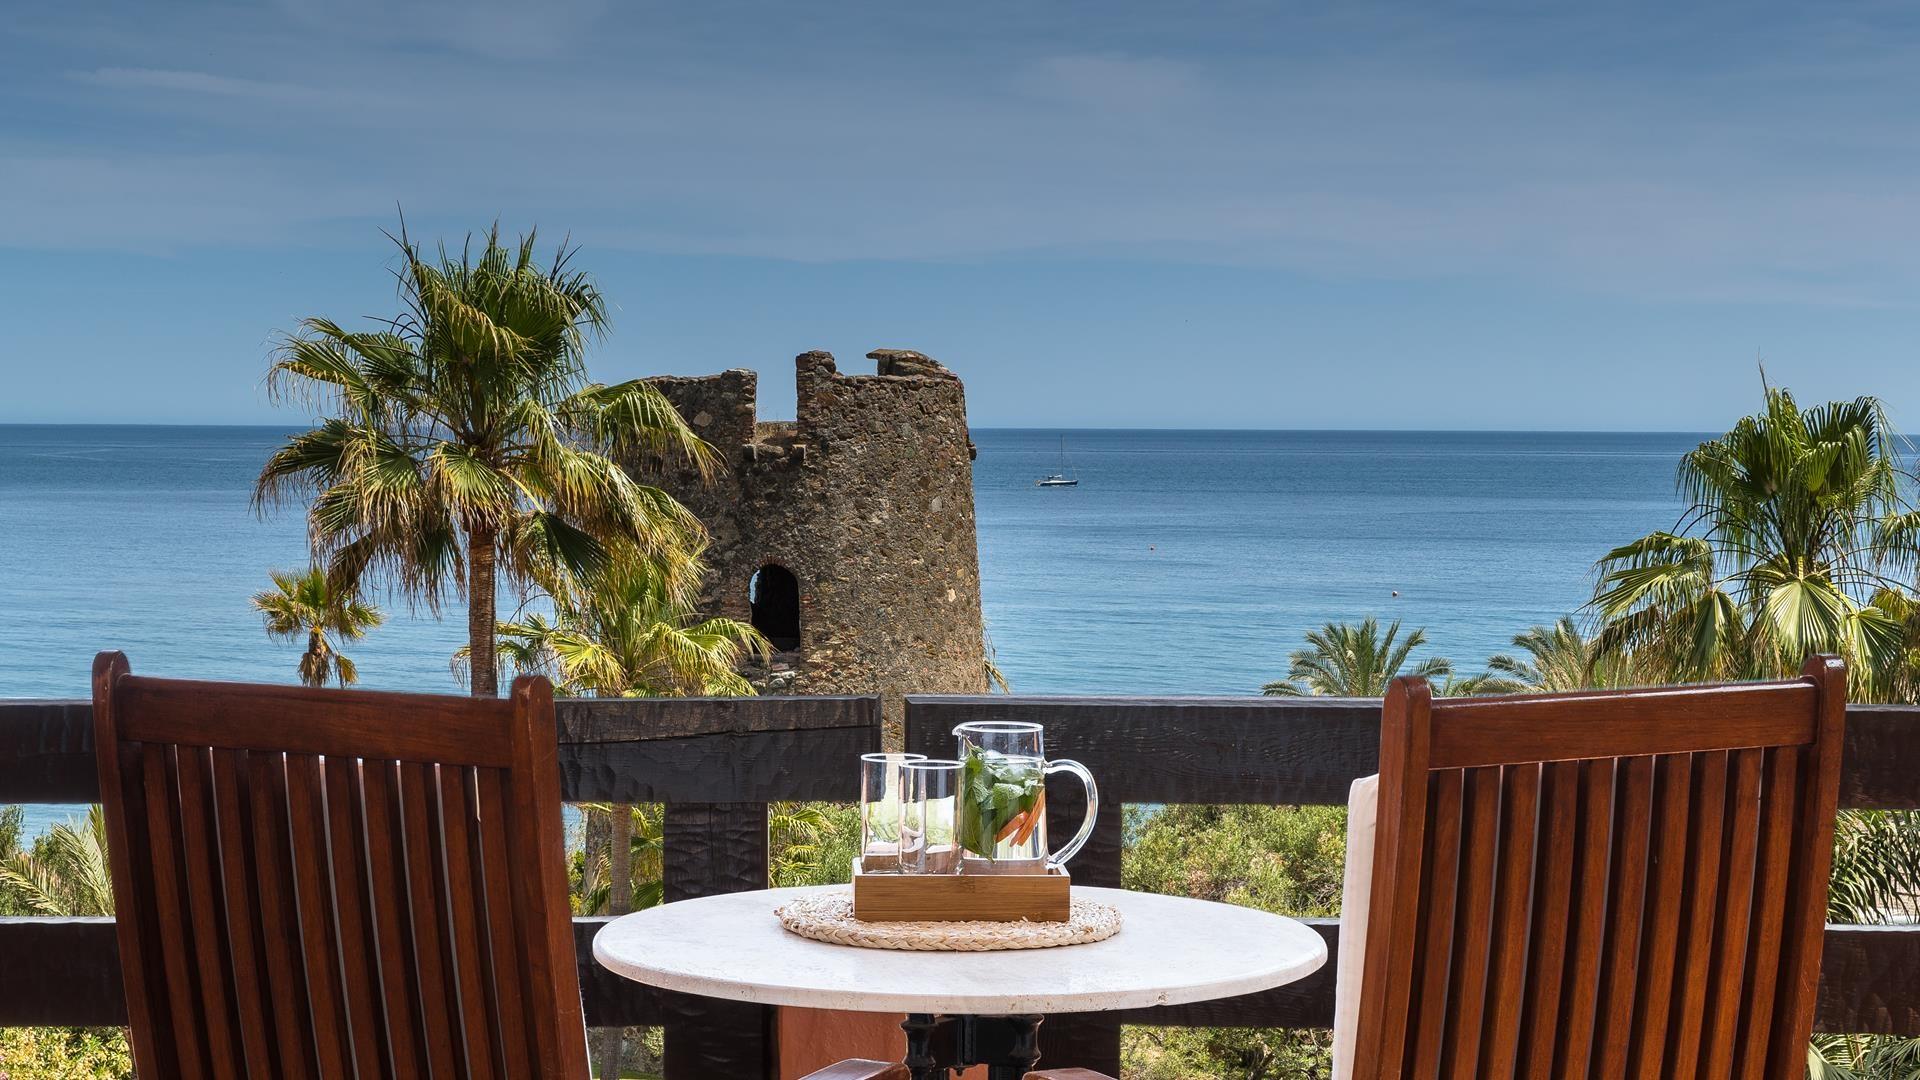 All Inclusive Sun Holidays to Kempinski Bahia Estepona